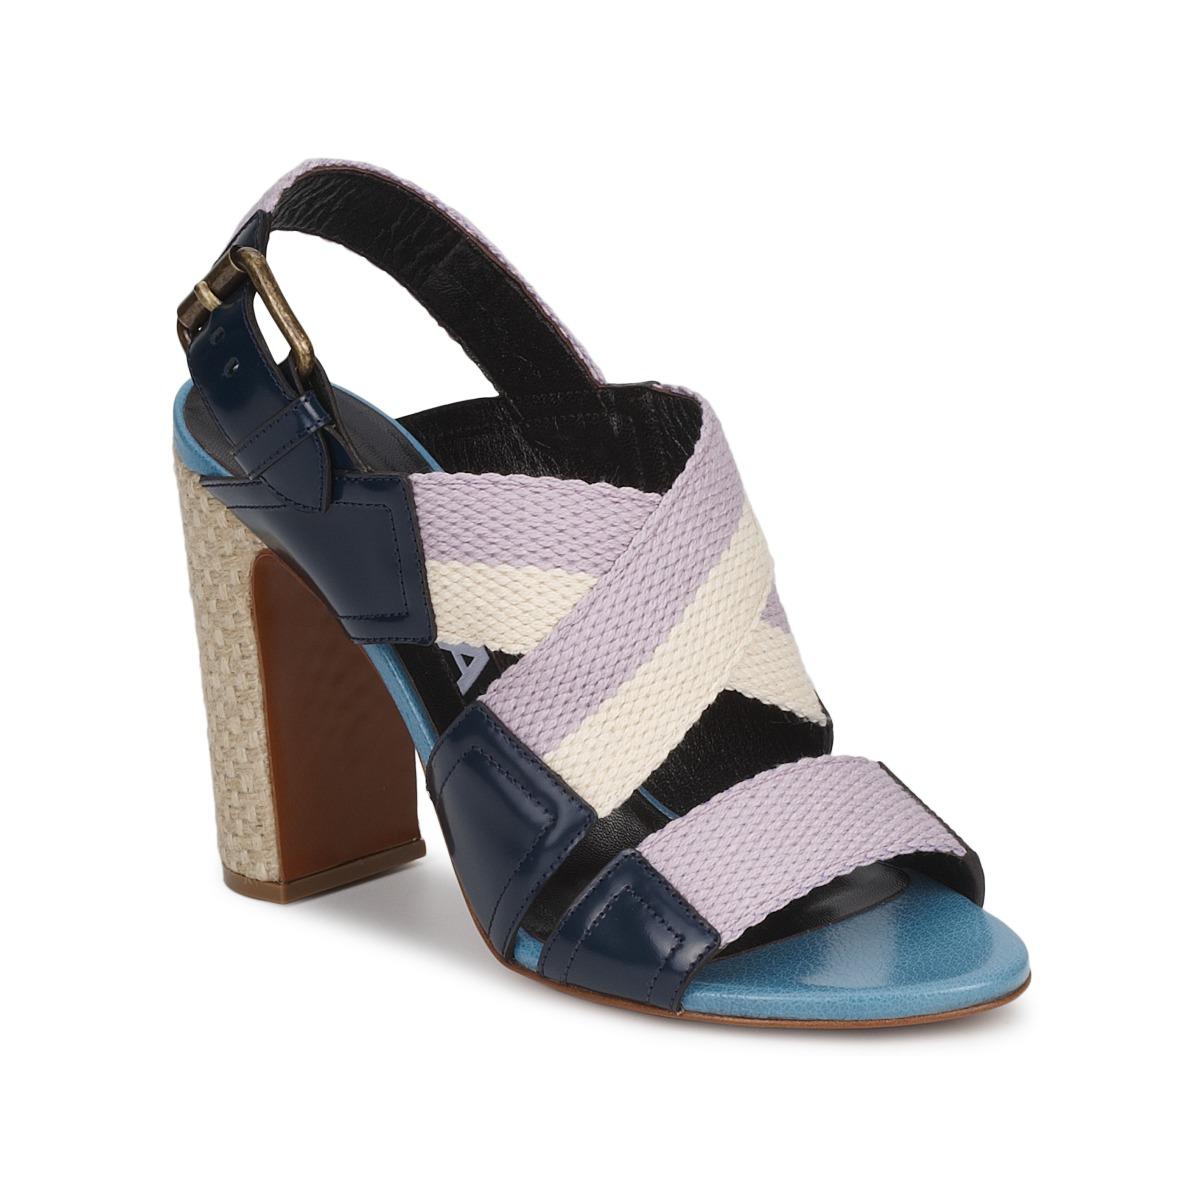 Sandale Rochas NASTR Noir/Violet/Ecru